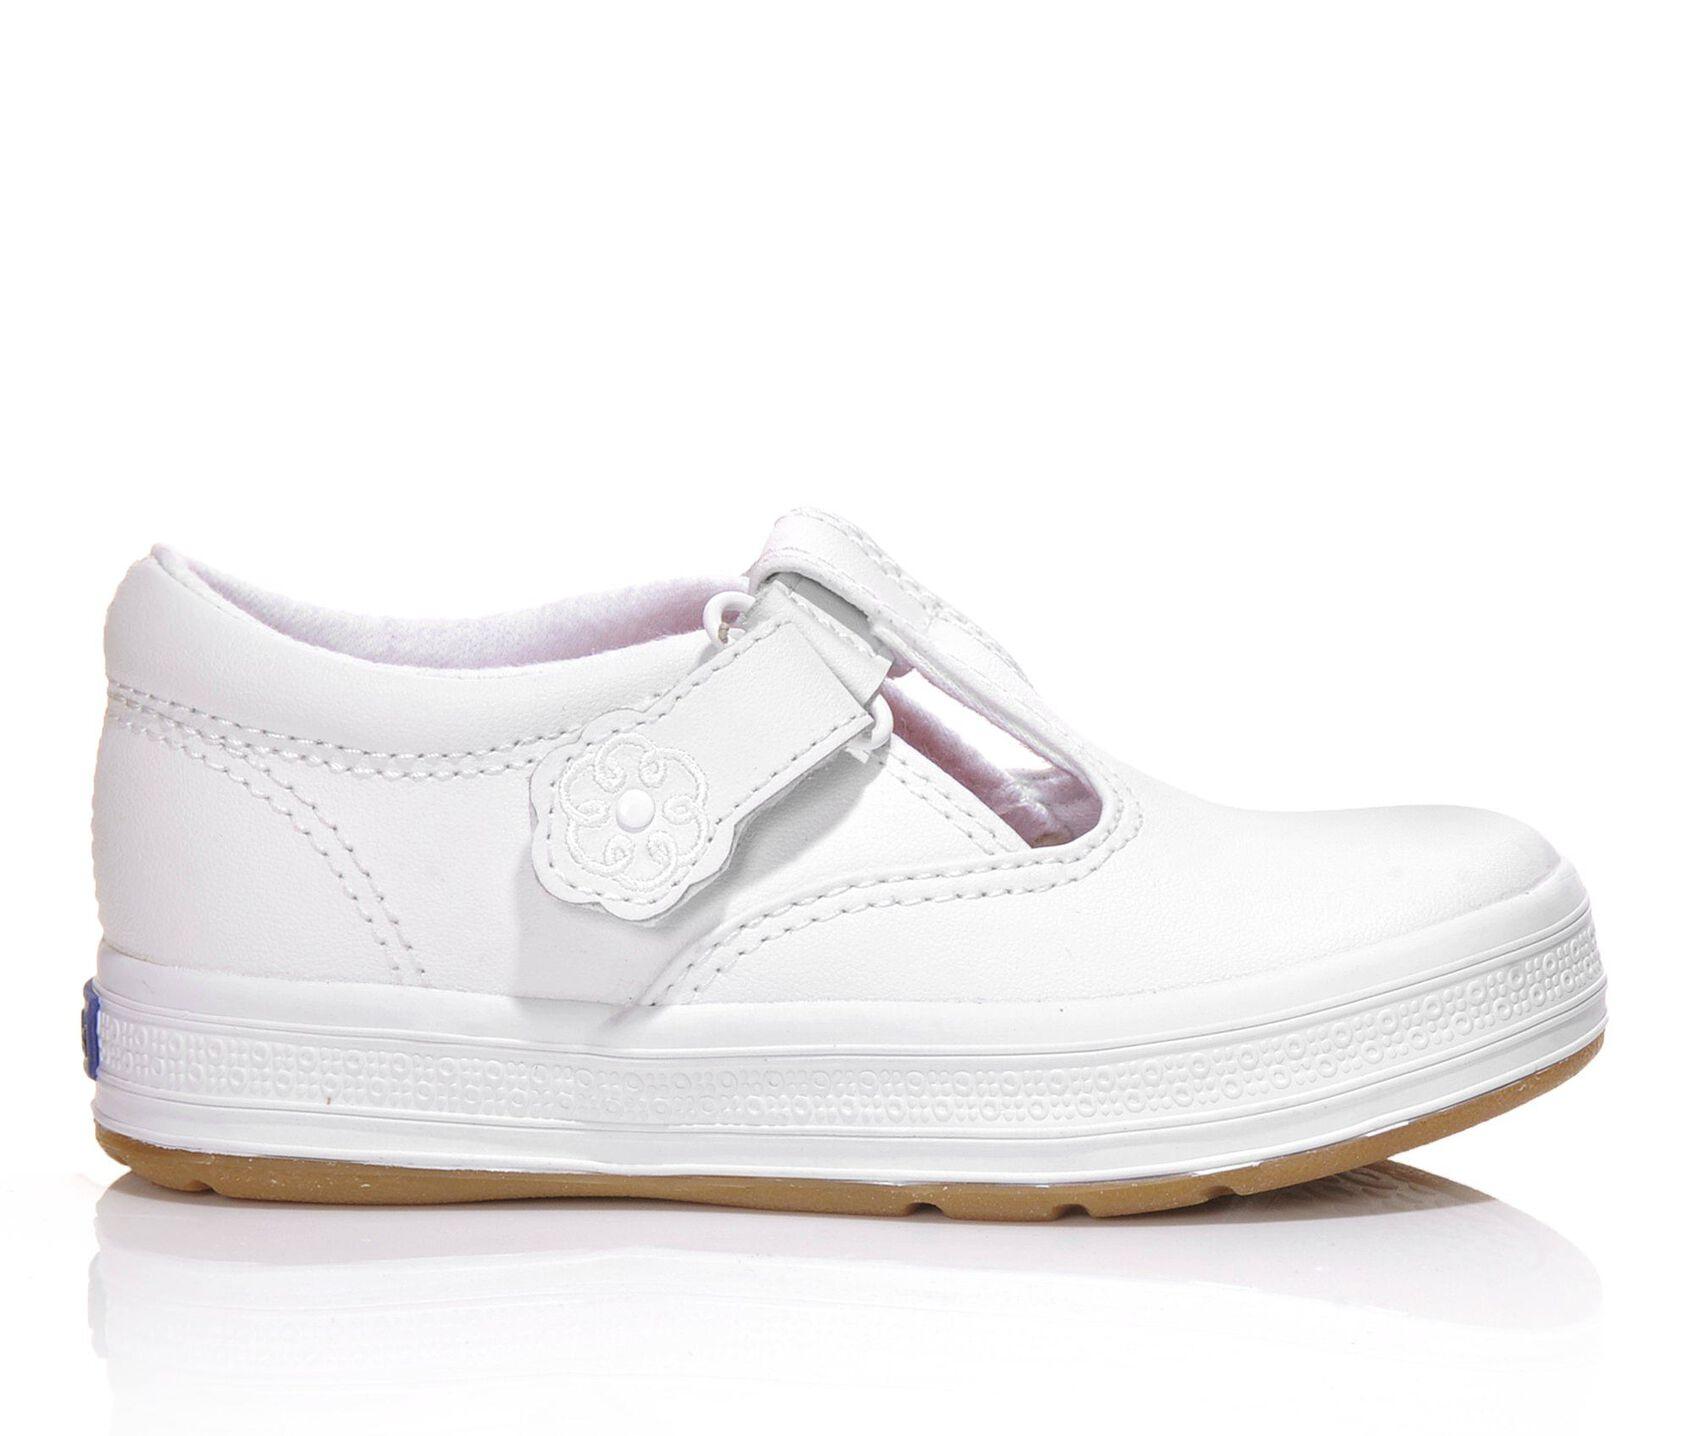 fa25df952bd00 Girls' Keds Infant & Toddler & Little Kid Daphne T-Strap Sneakers ...